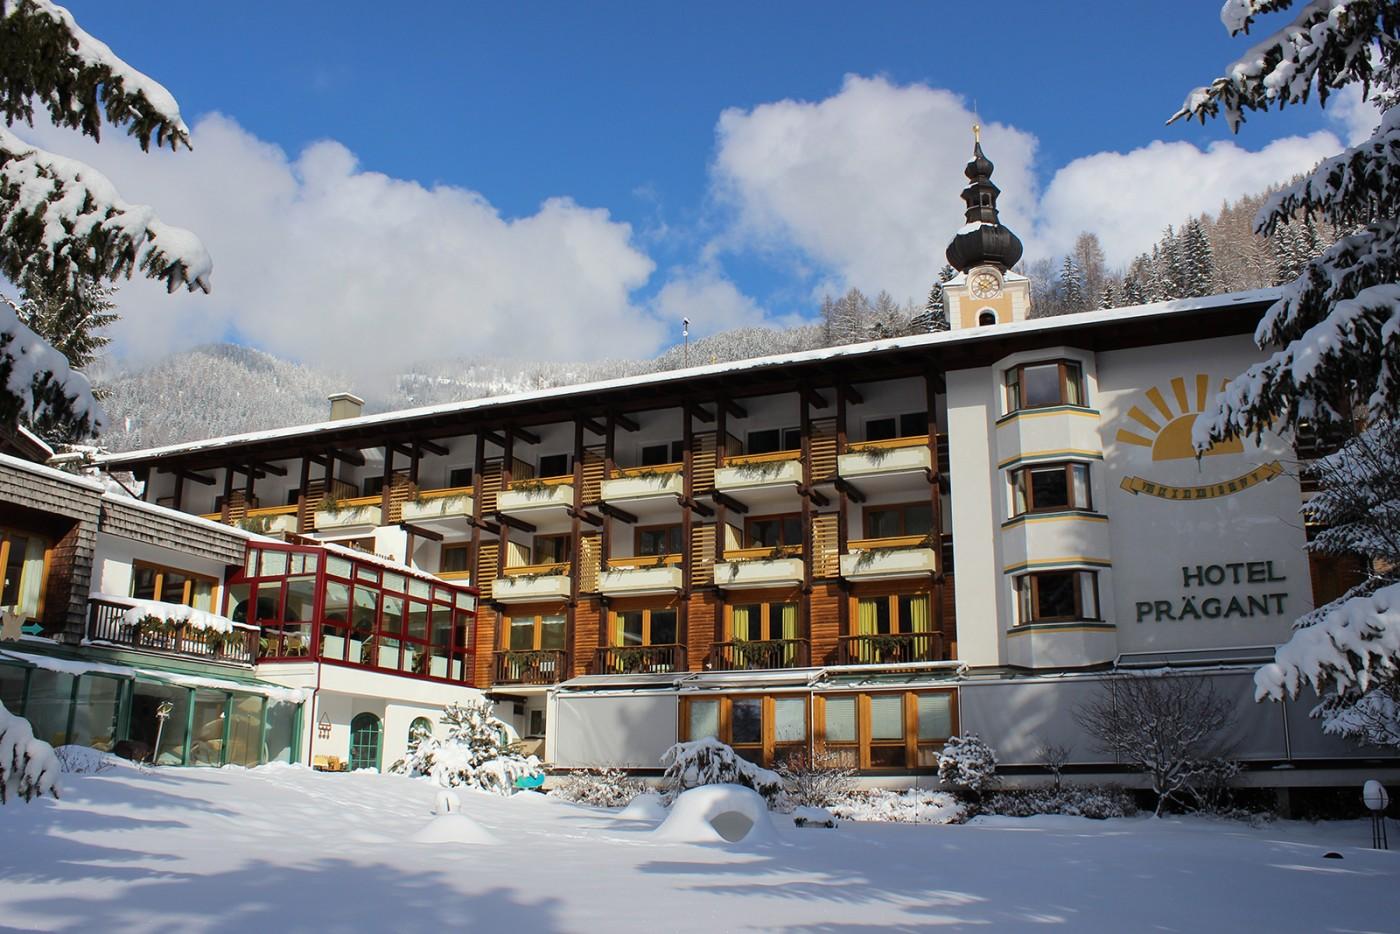 Hotel Prägant in inverno